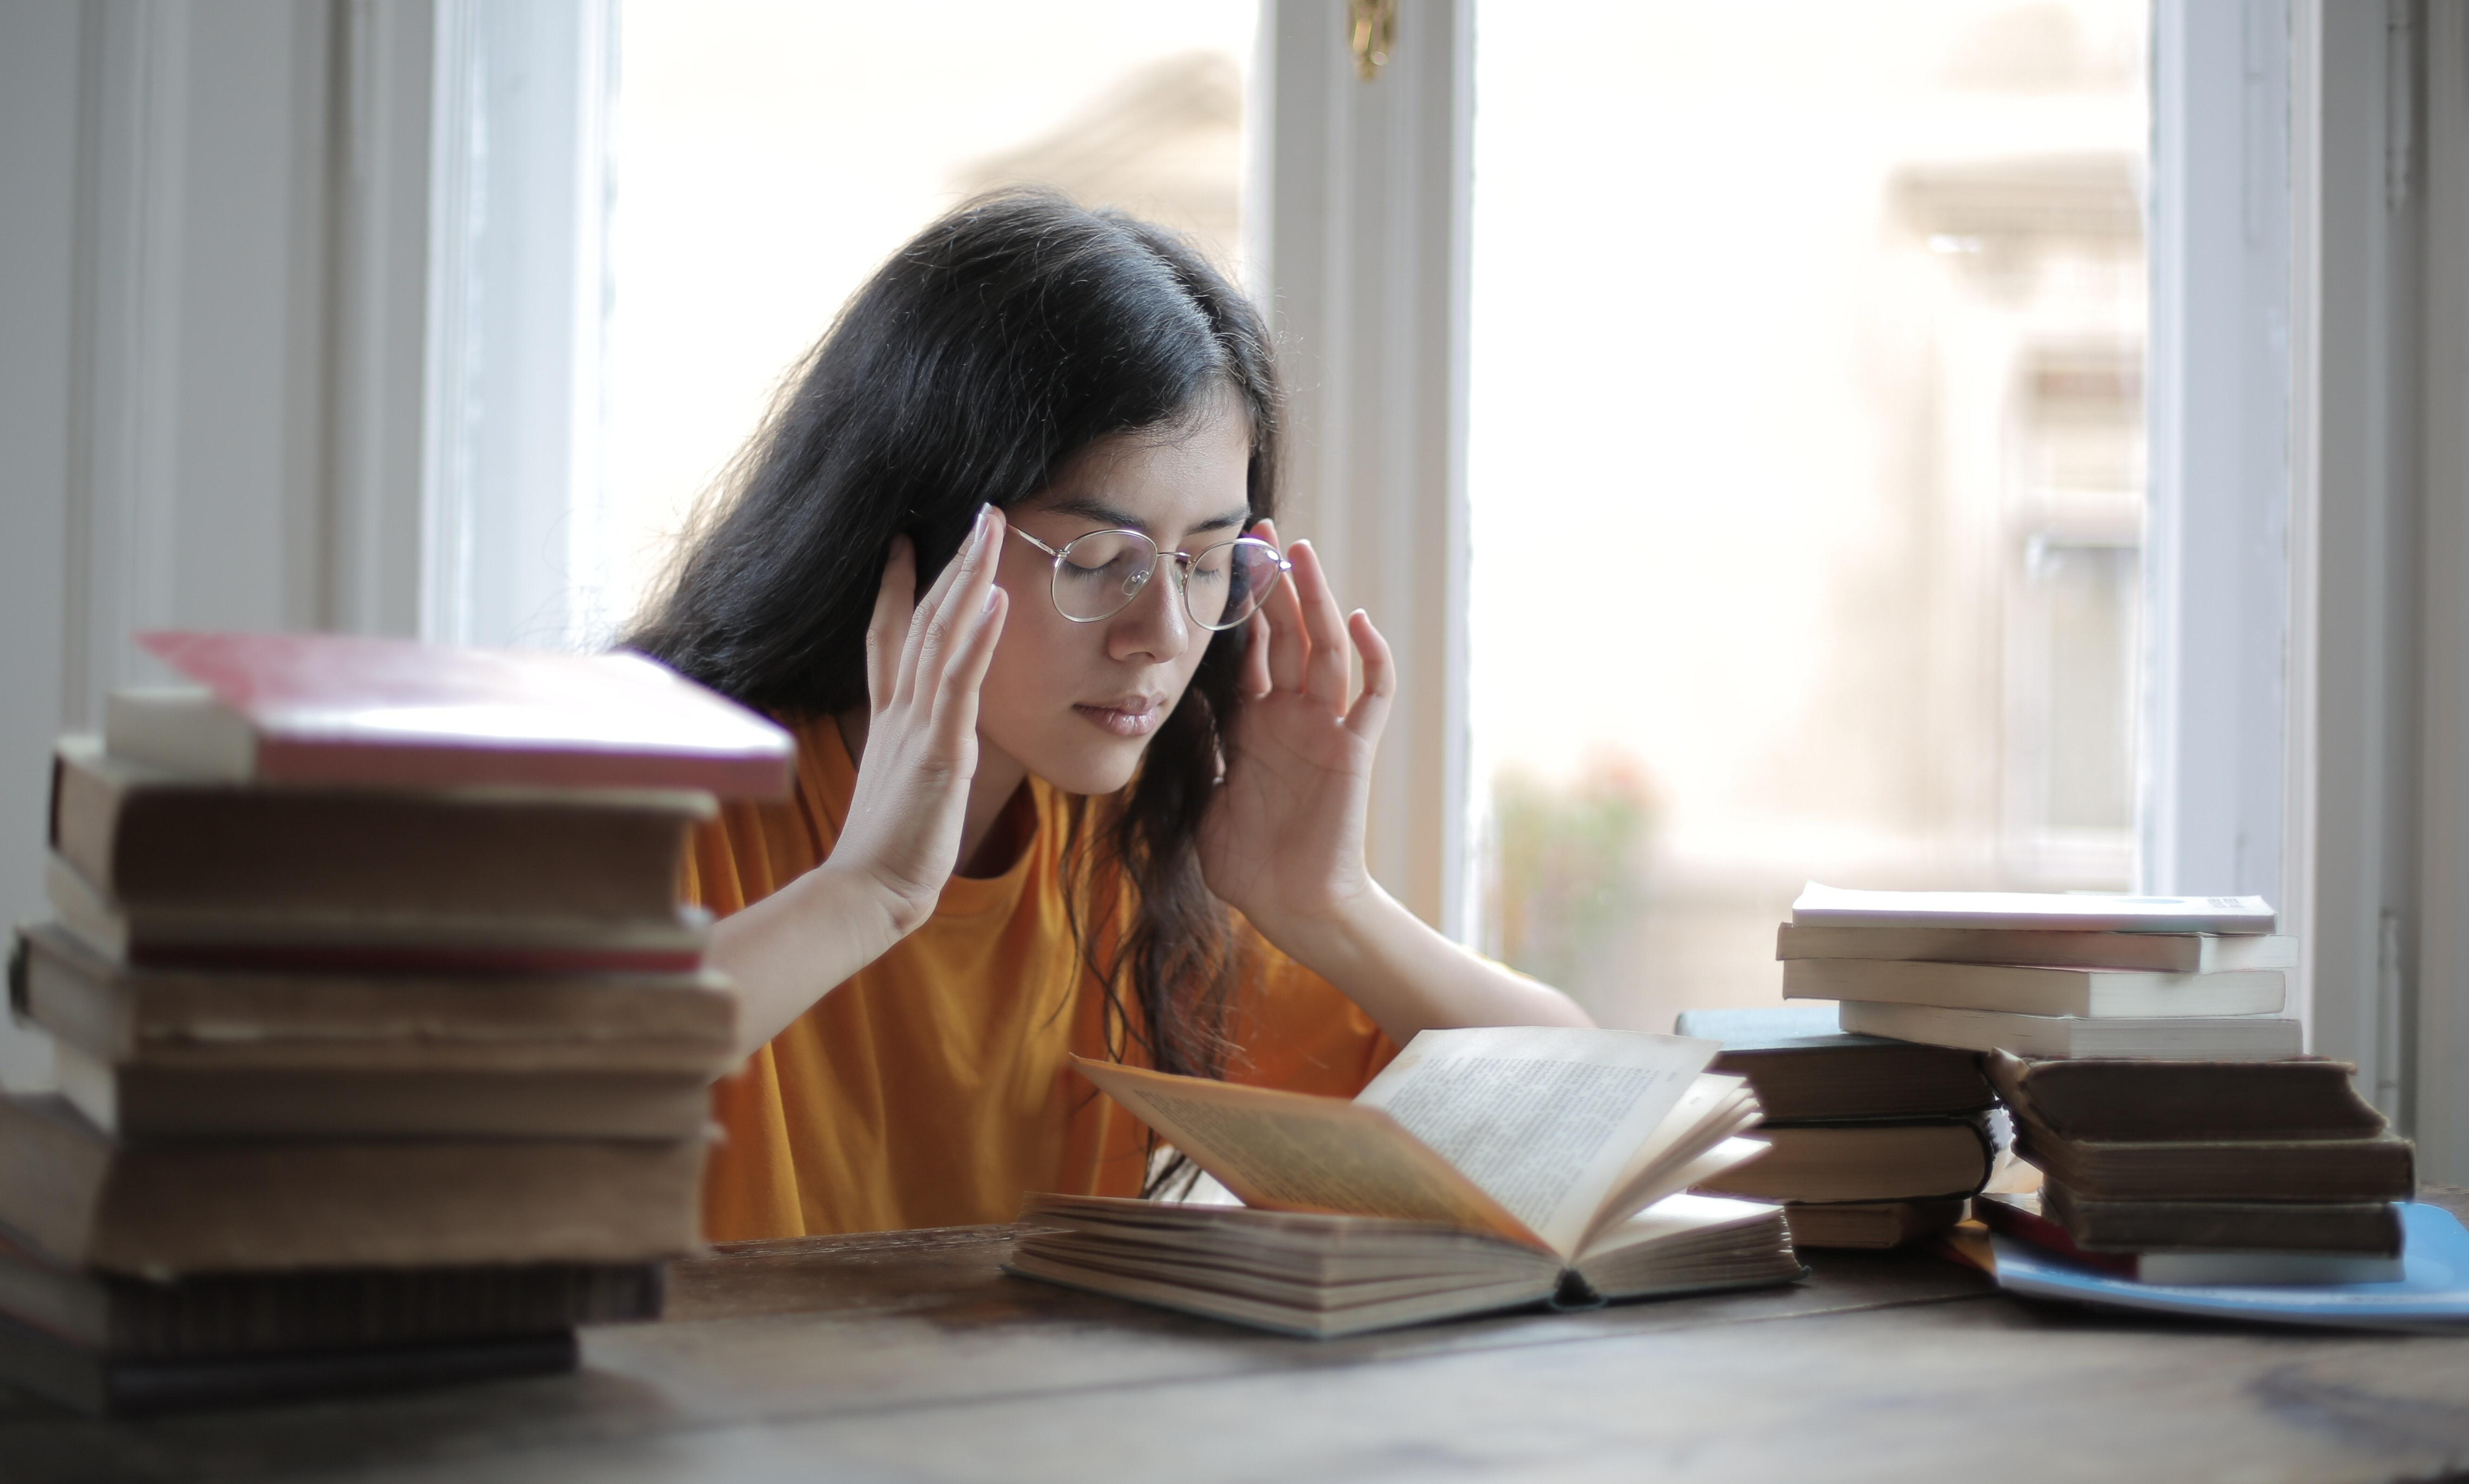 Girl feeling stressed over H2 Chemistry lessons